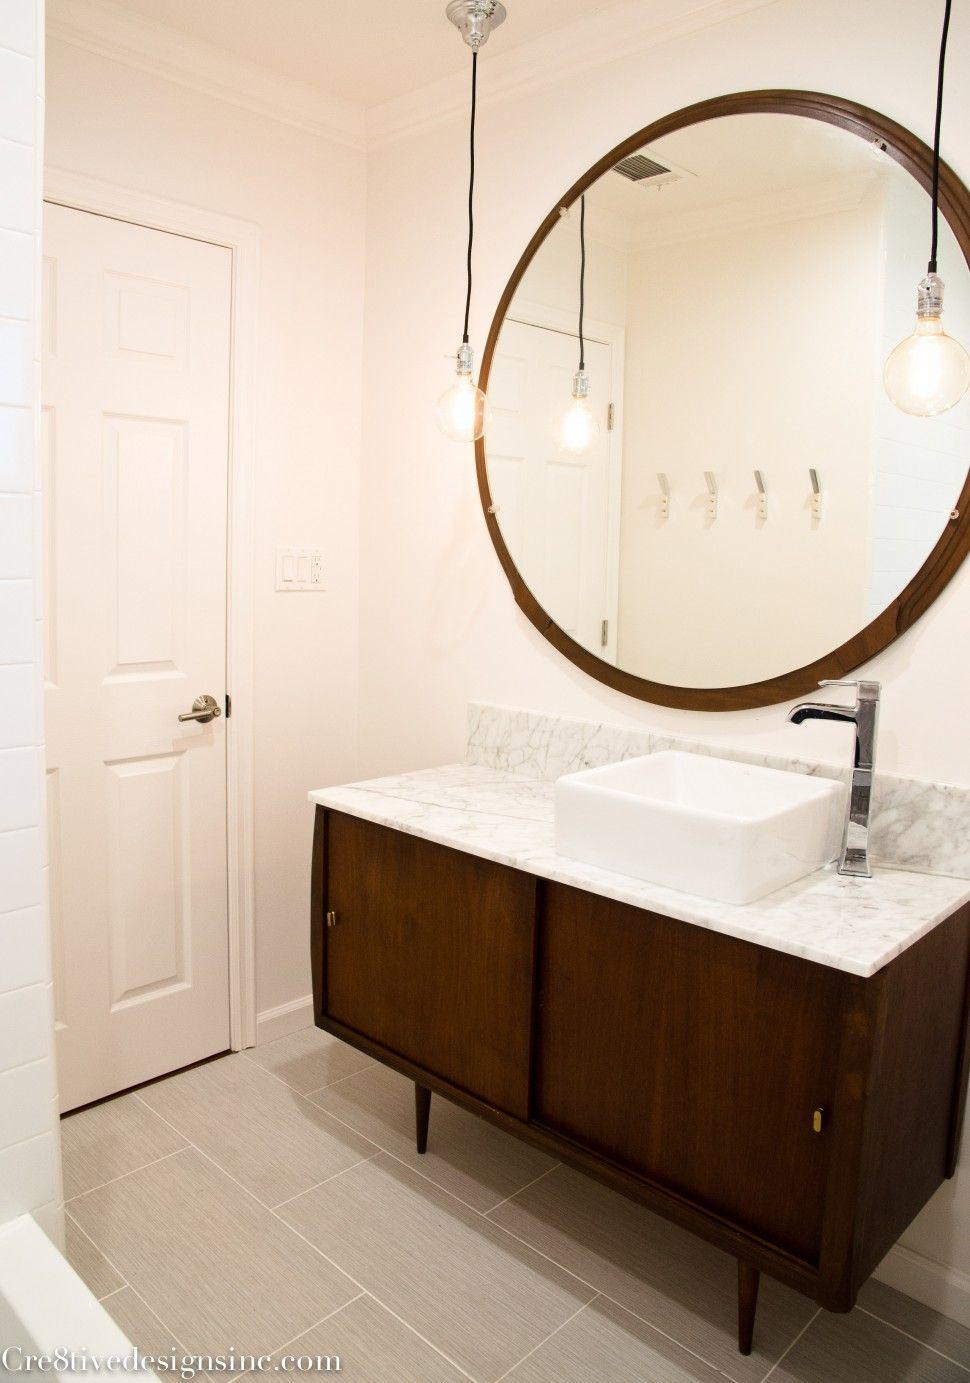 inc modern designs vanity mid century bathroom